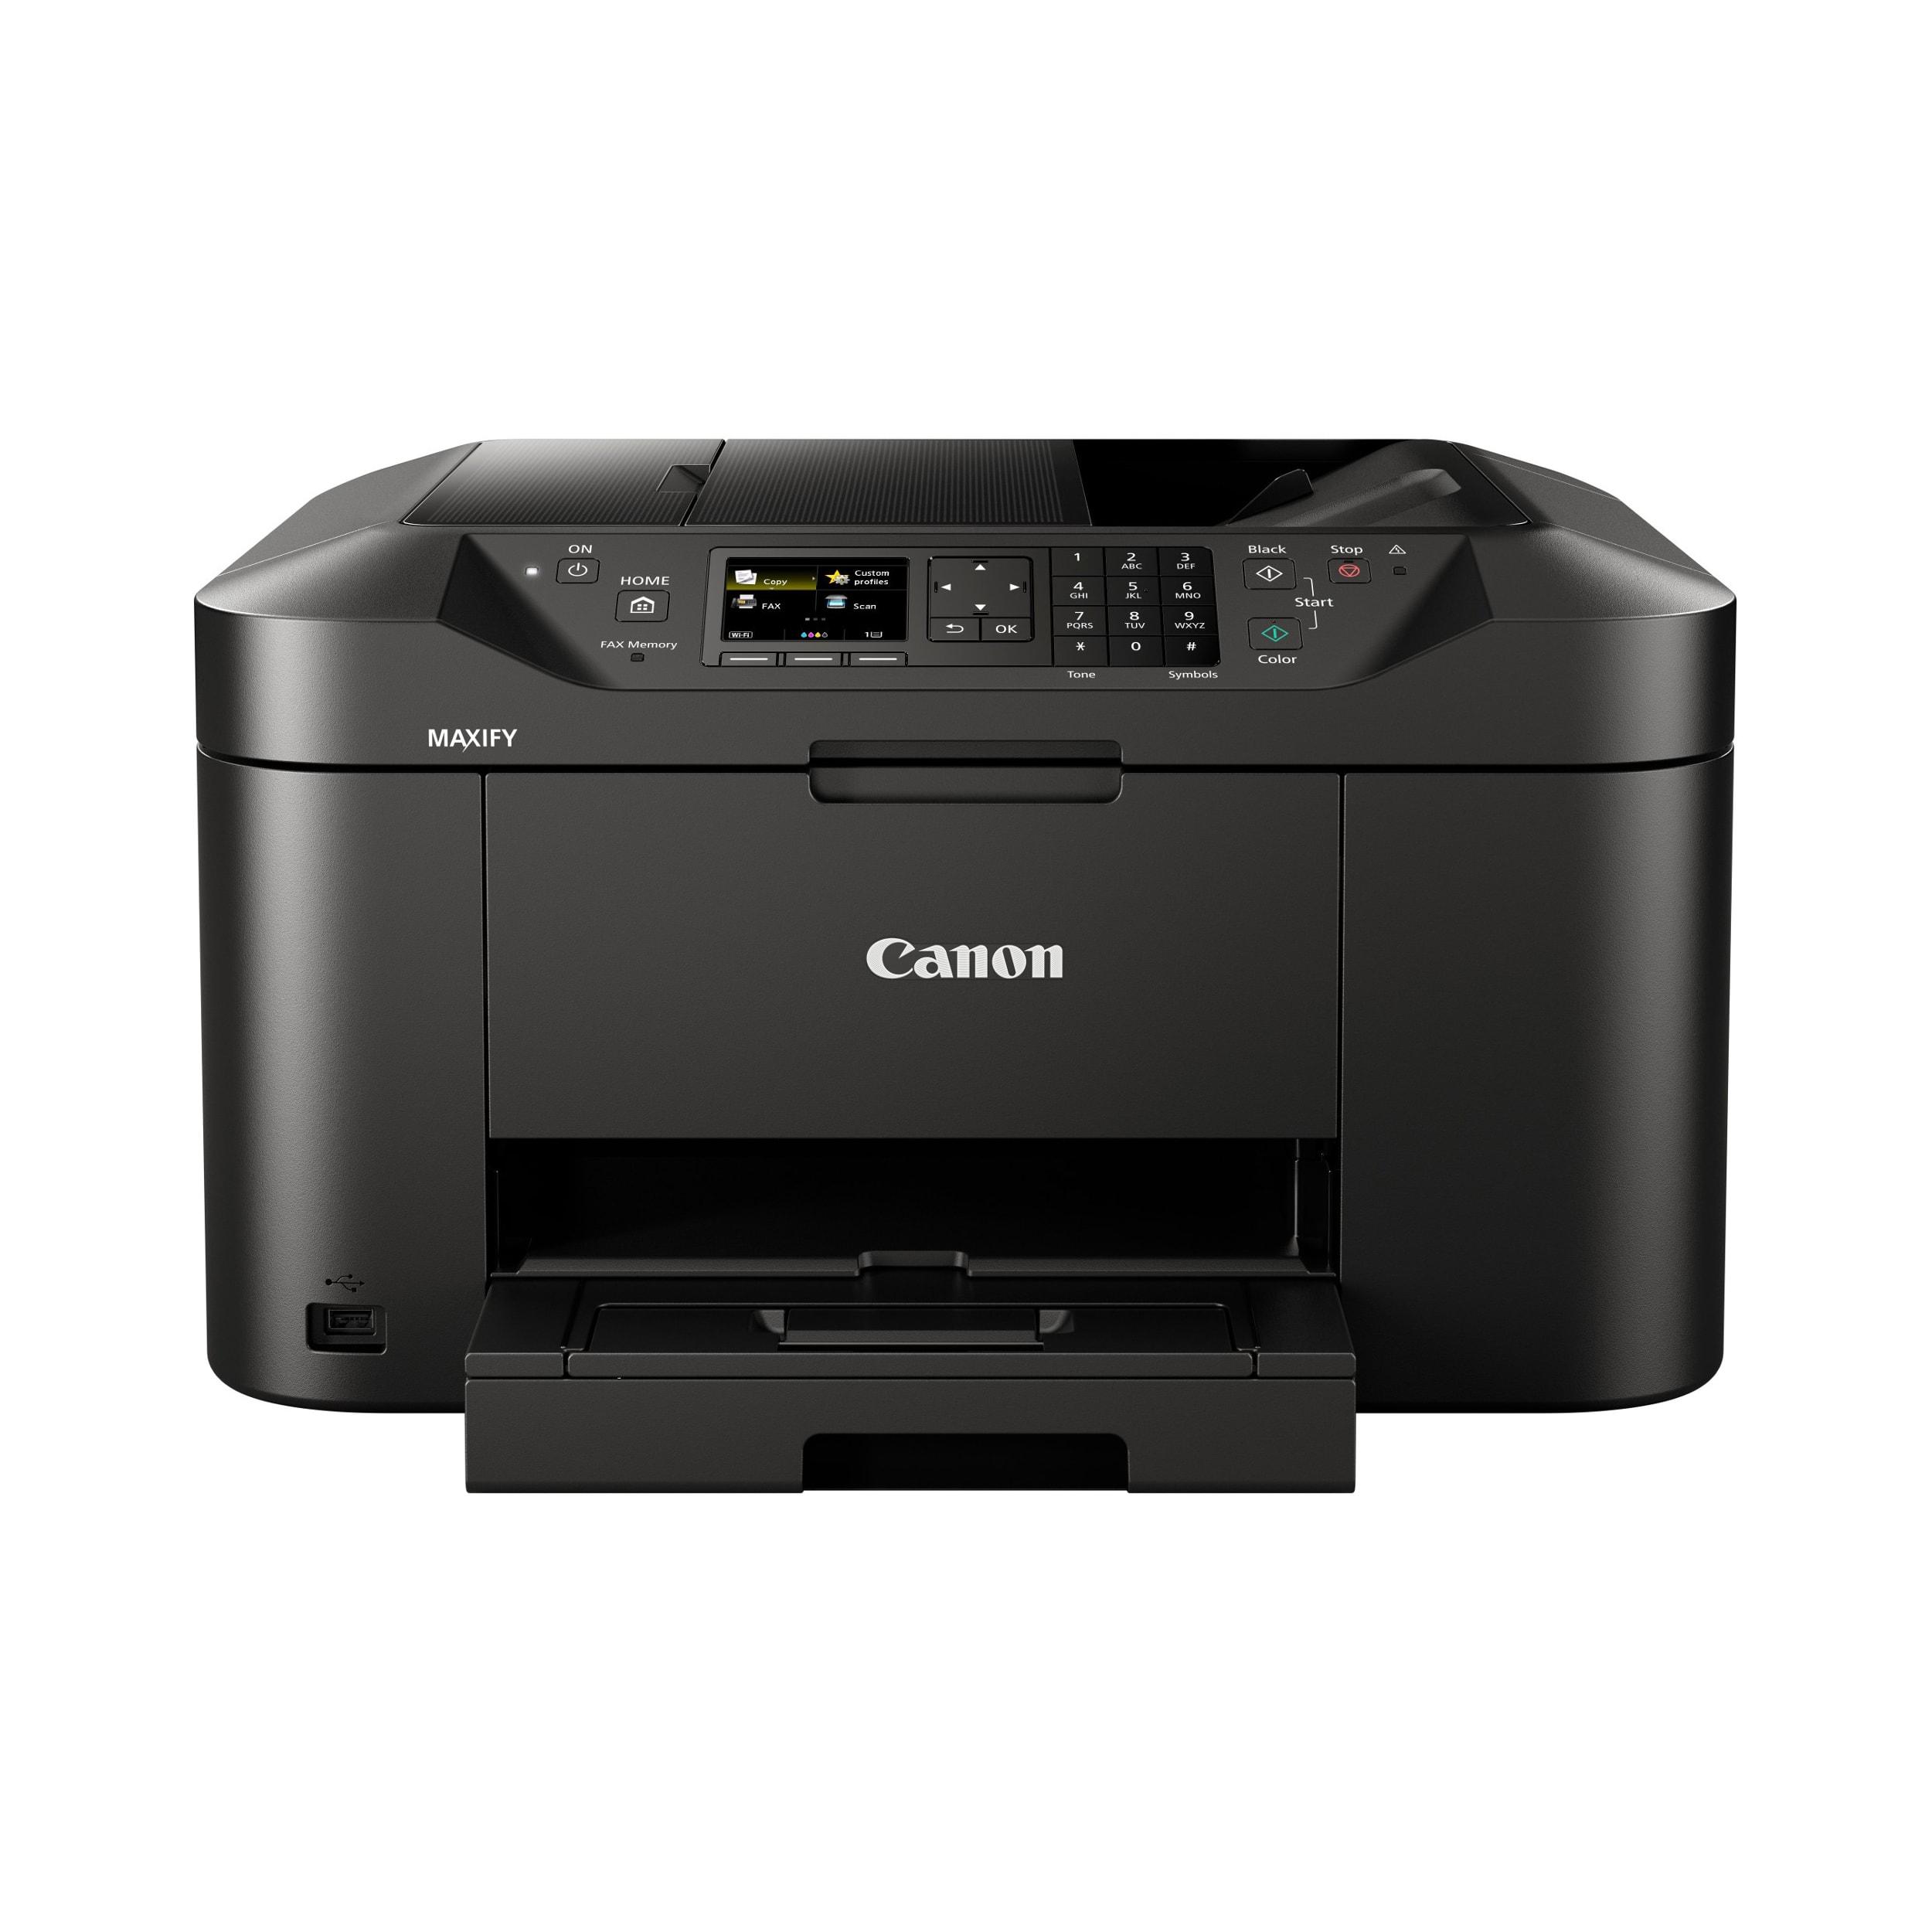 Imprimante multifonction Canon MAXIFY MB2155 - Cybertek.fr - 0